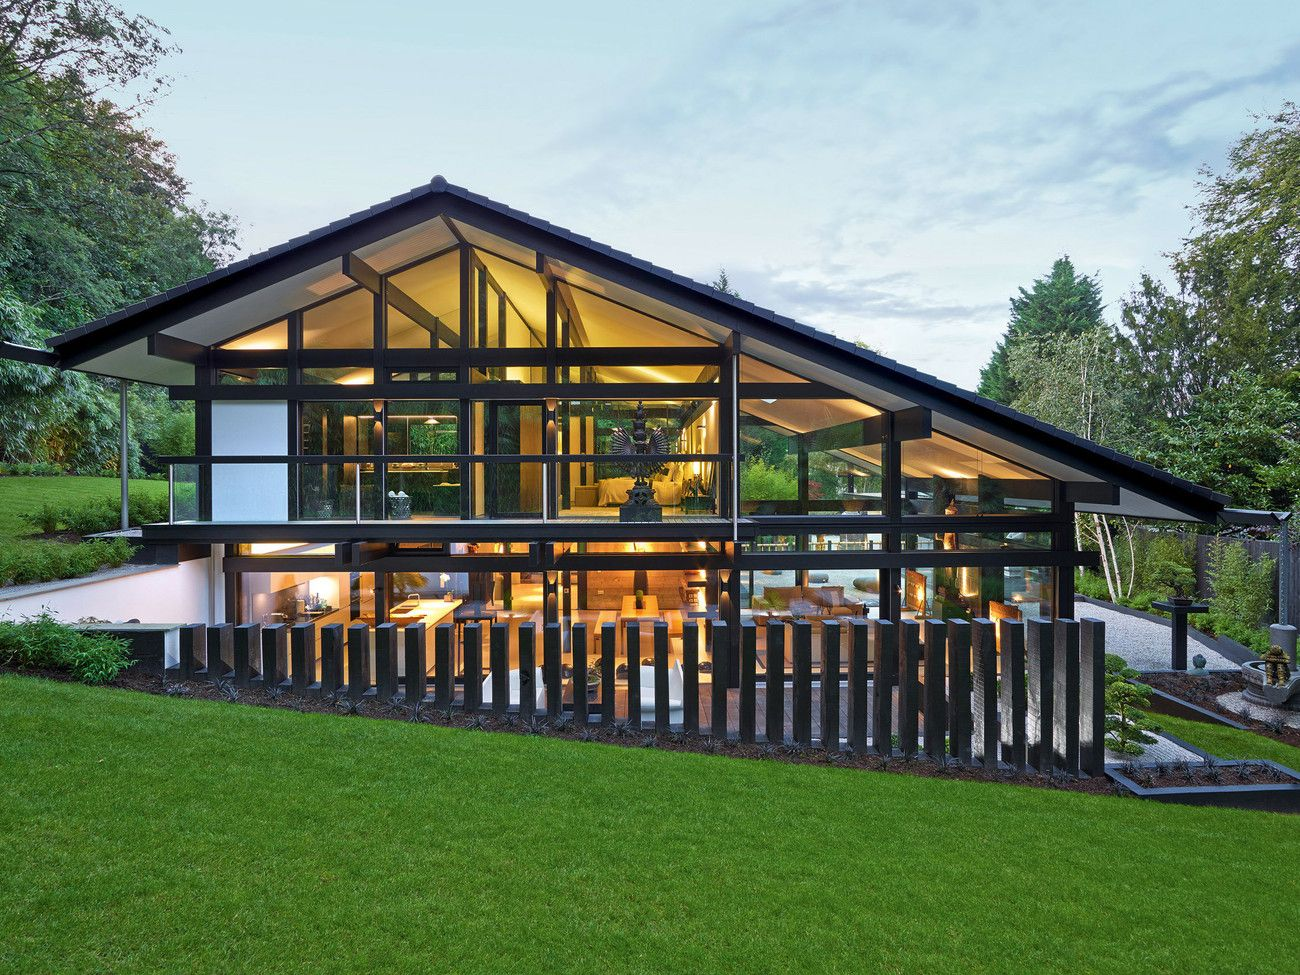 Gallery - HUF HAUS | Barn Home | Pinterest | Huf, Haus and Barn